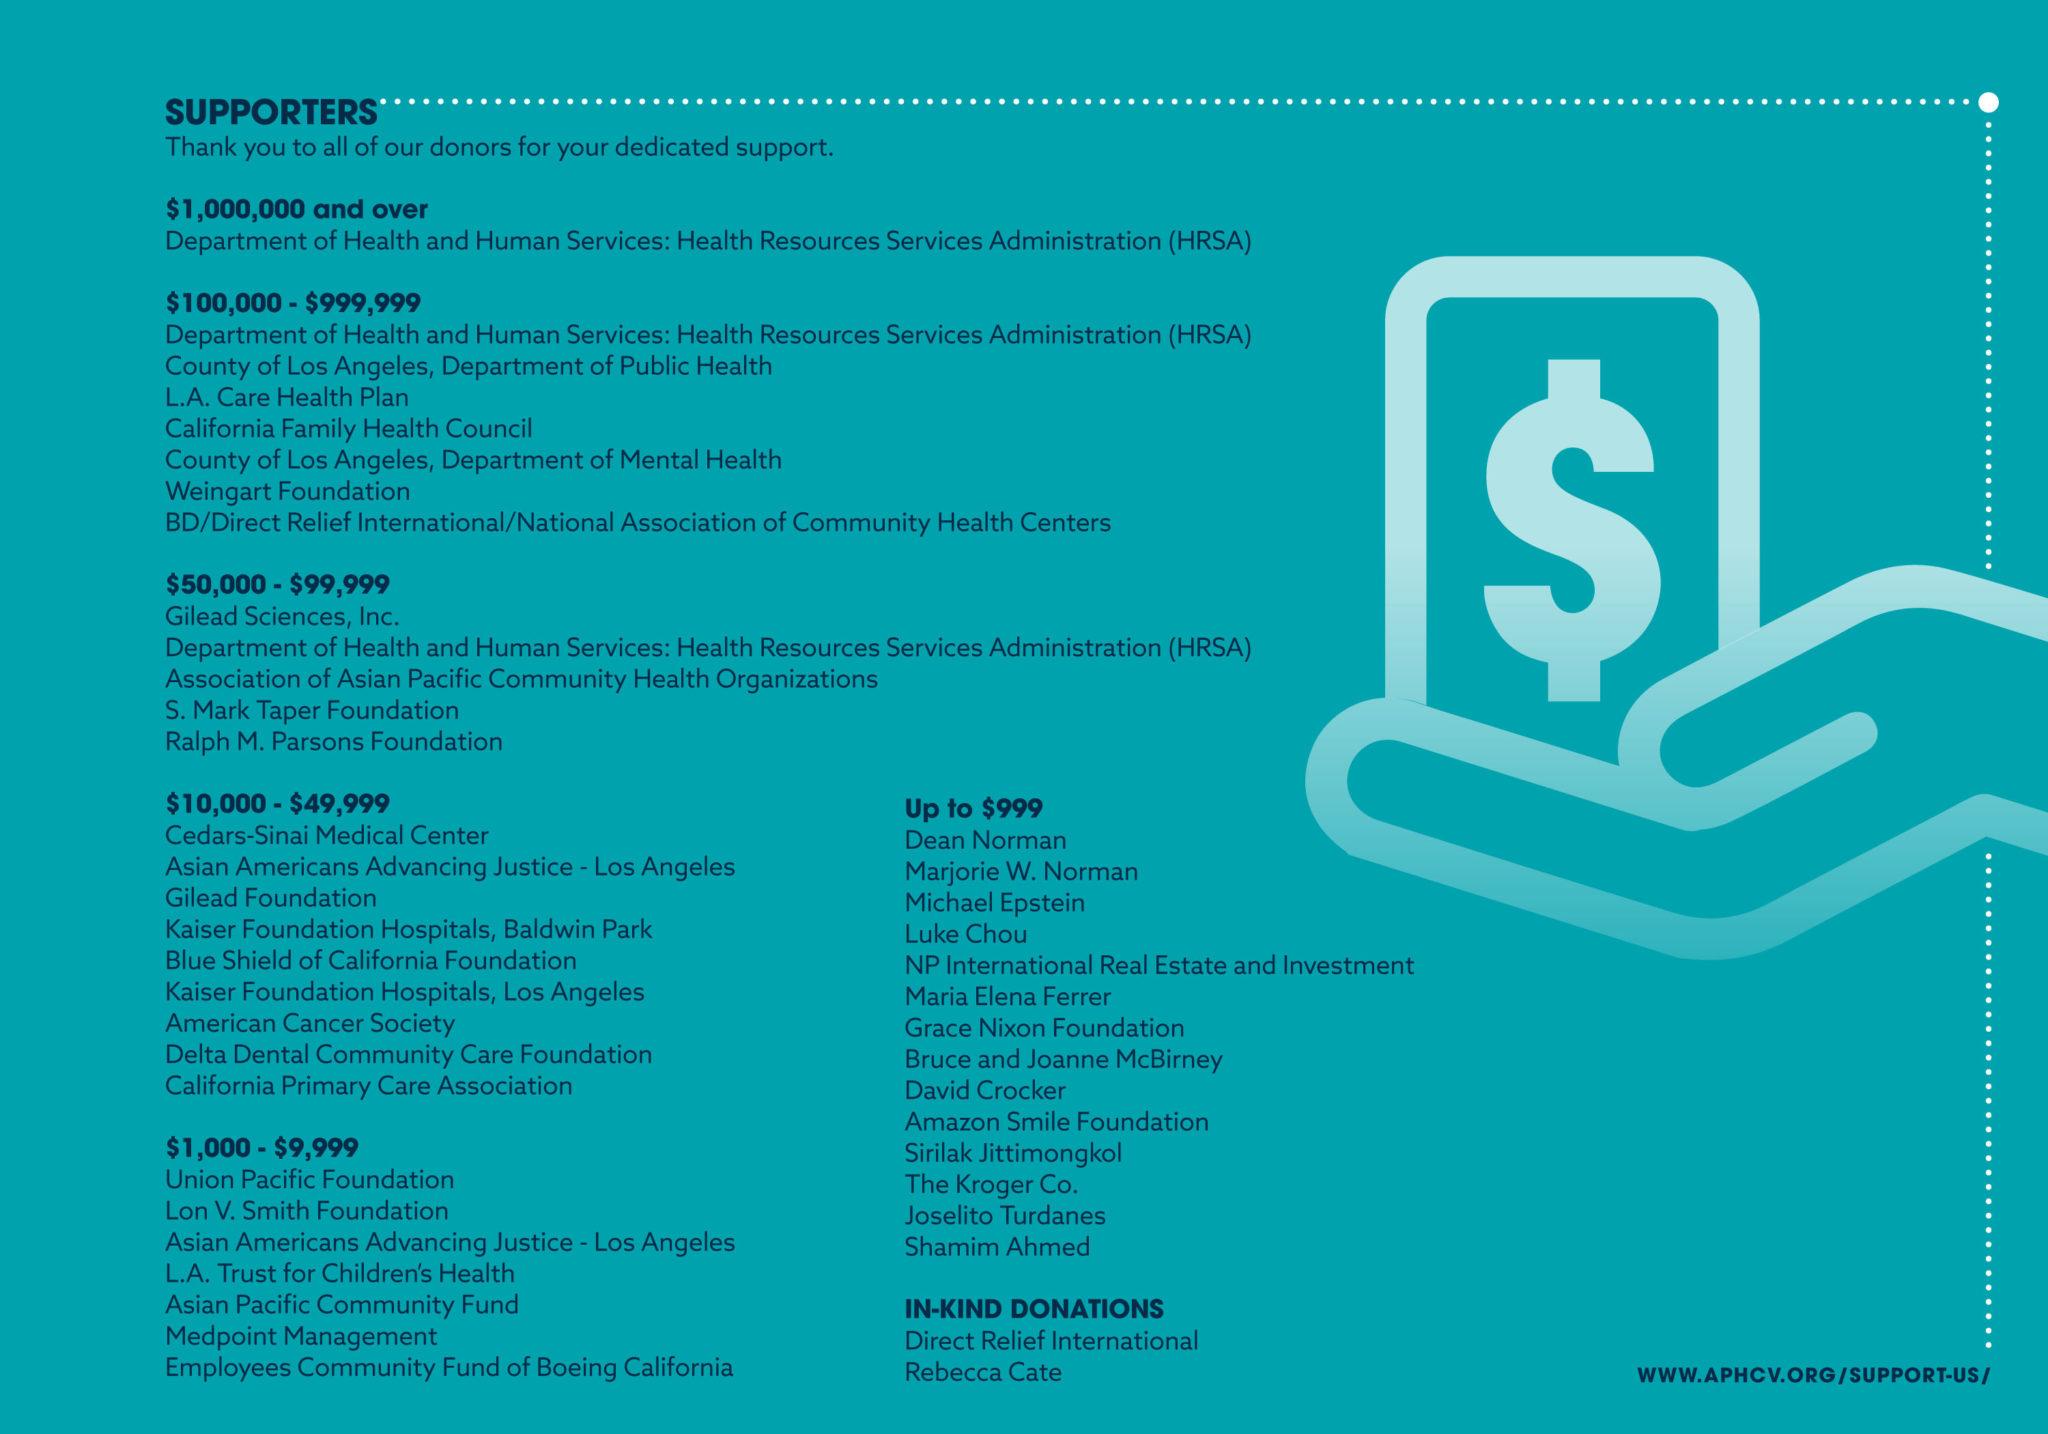 APHCV Annual Report Page 7